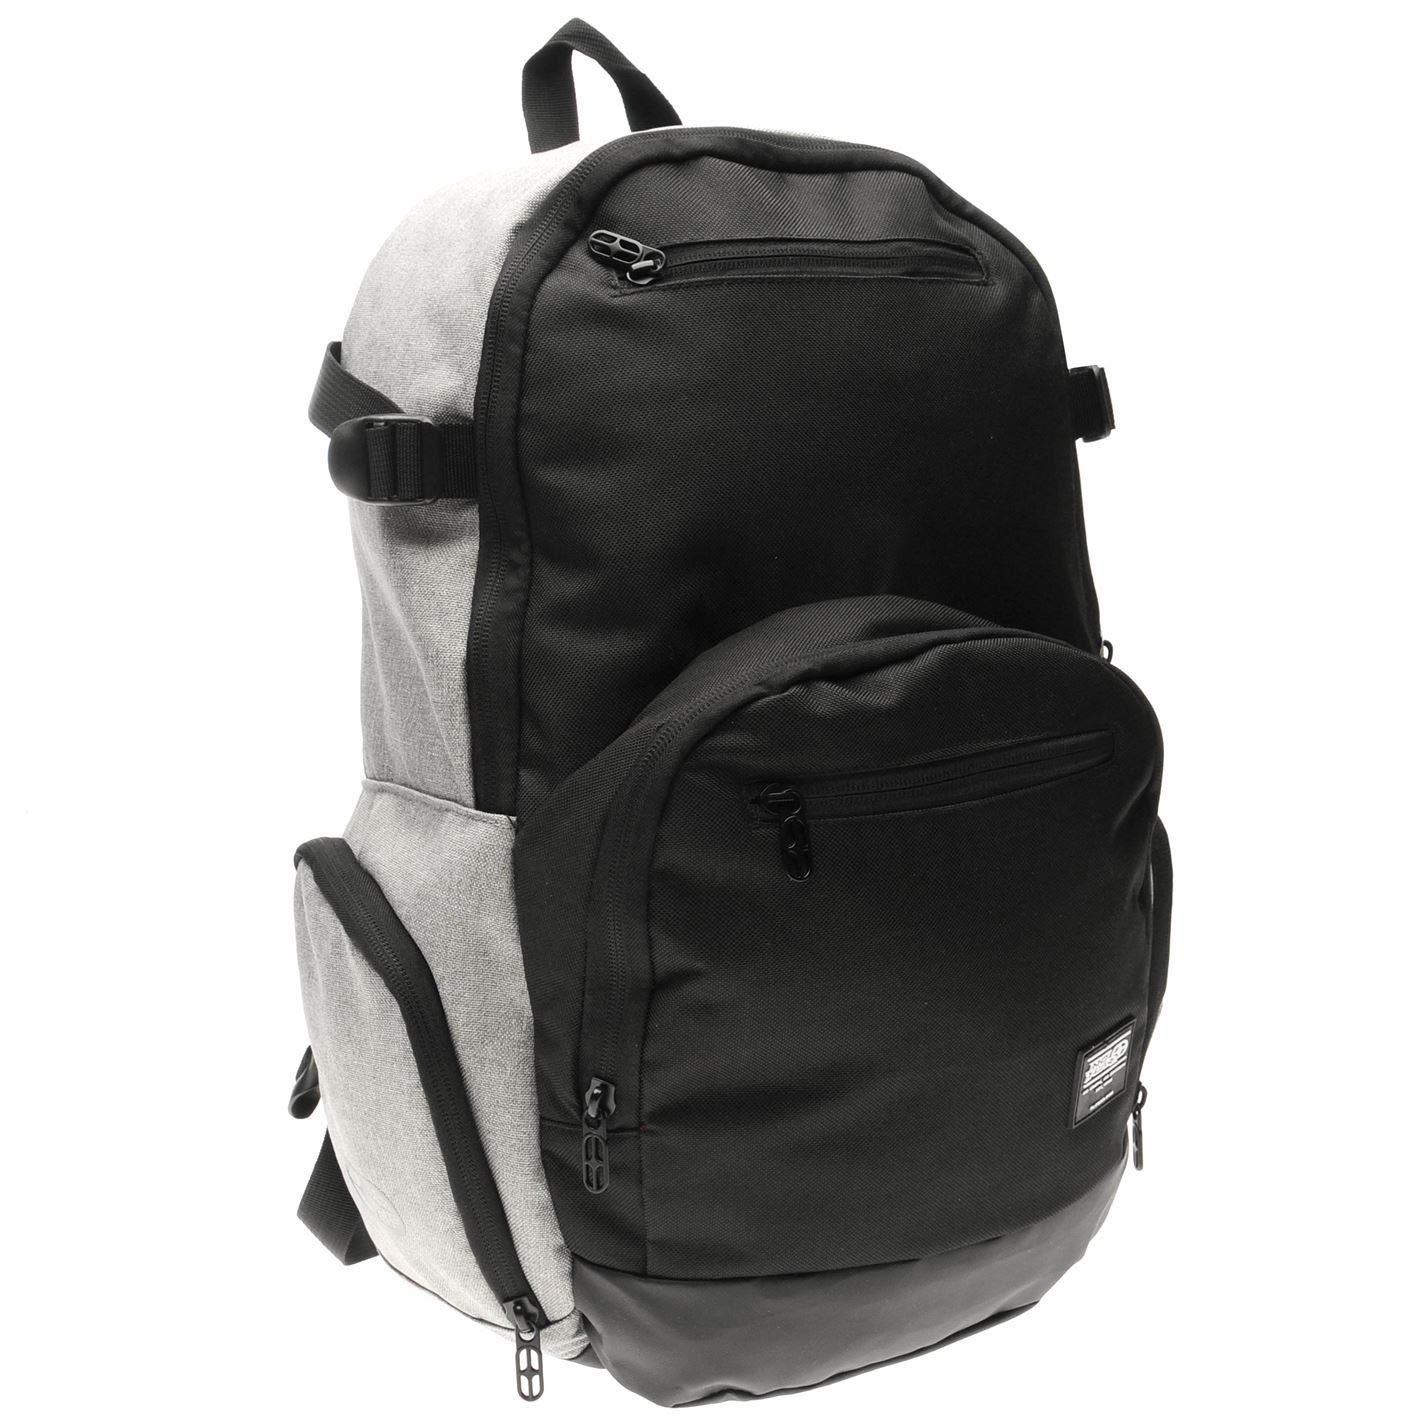 Elevate - Grey Charcoal No Fear Backpacks Rucksack Backpack Bag Daypack